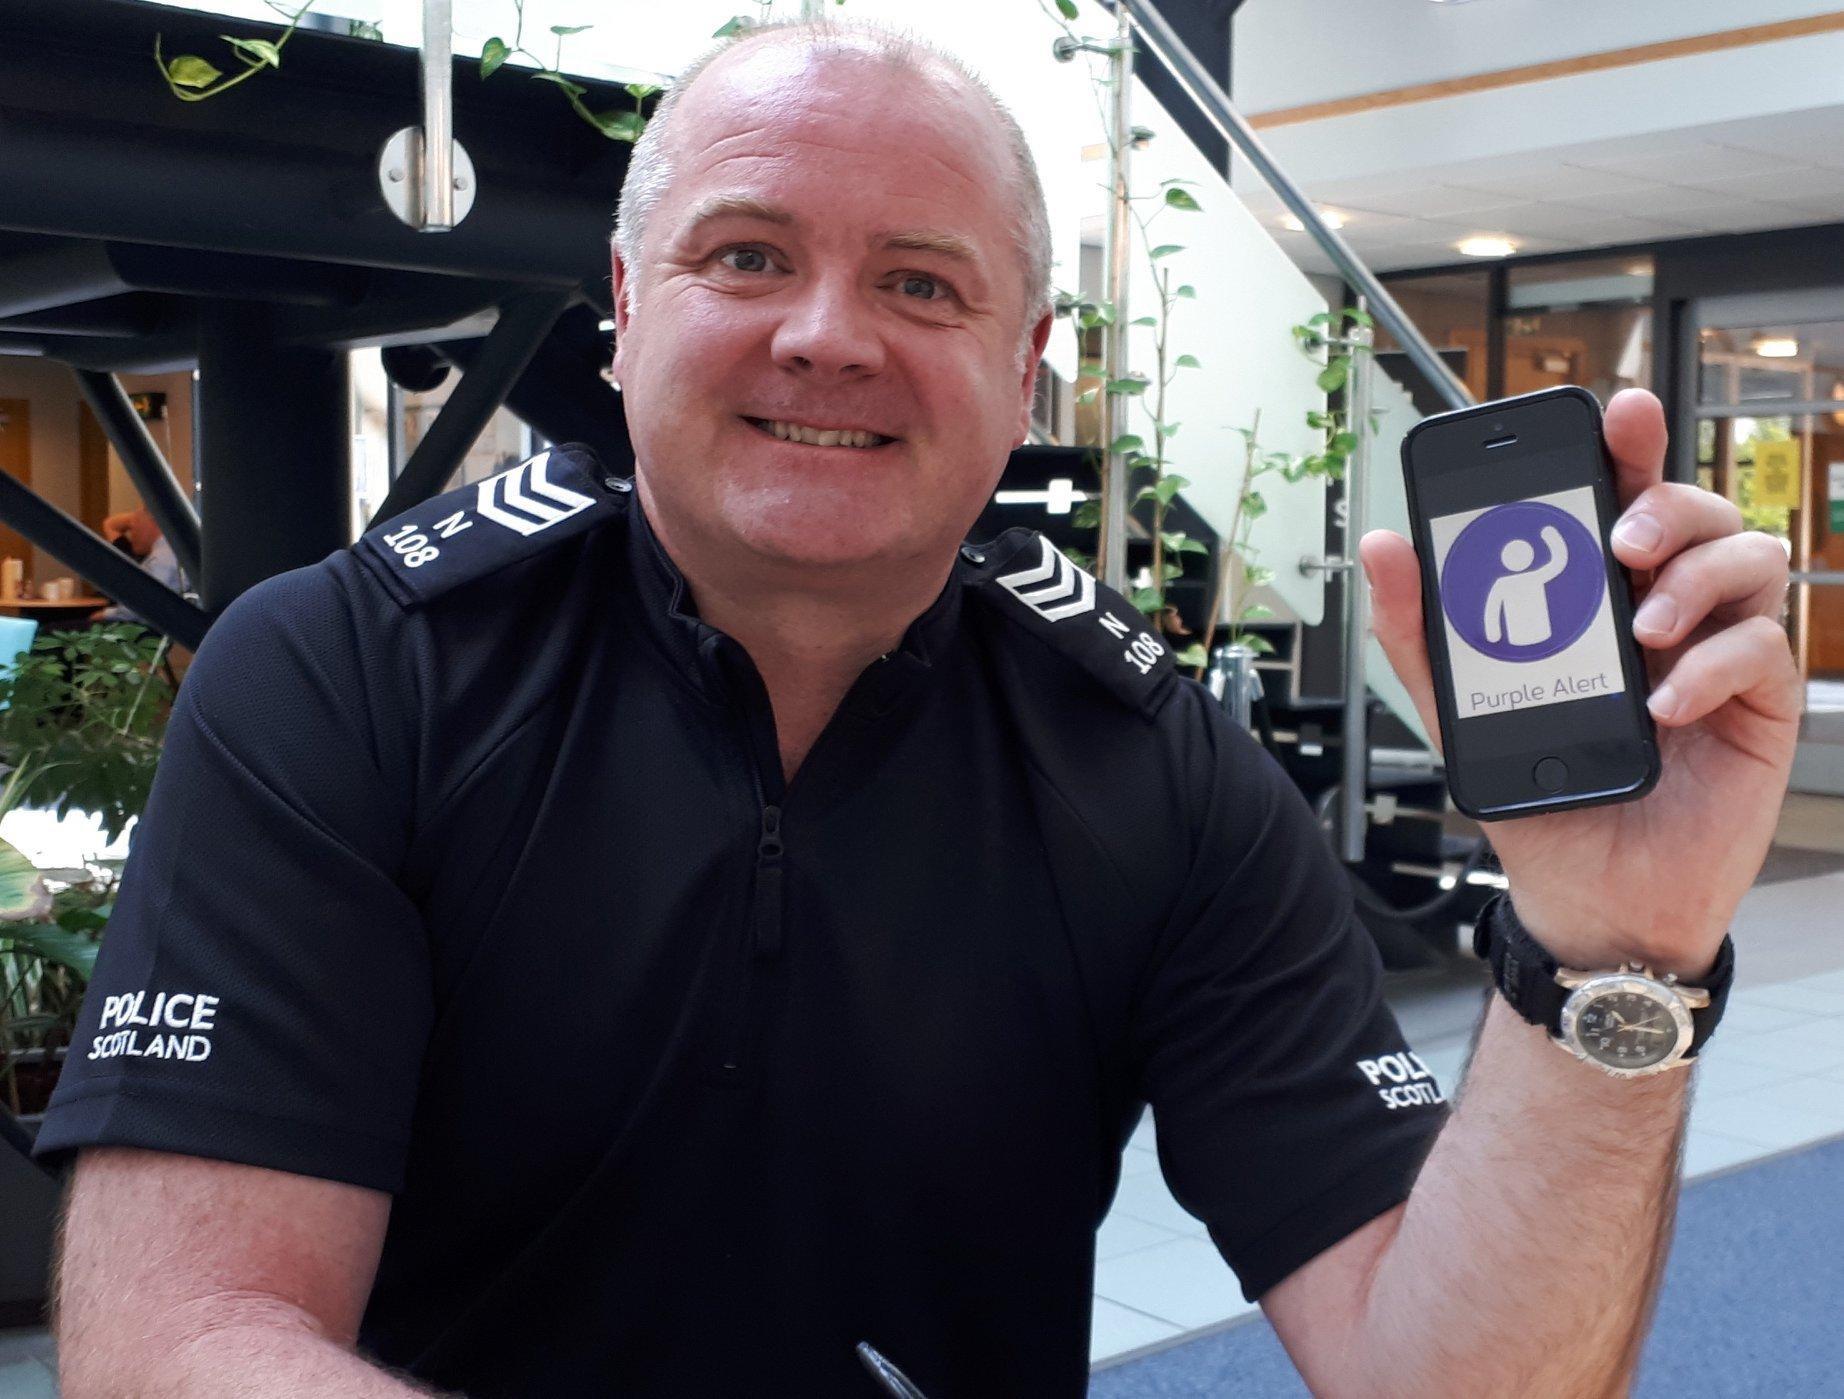 Sergeant David Campbell is encouraging people to download Purple Alert app.